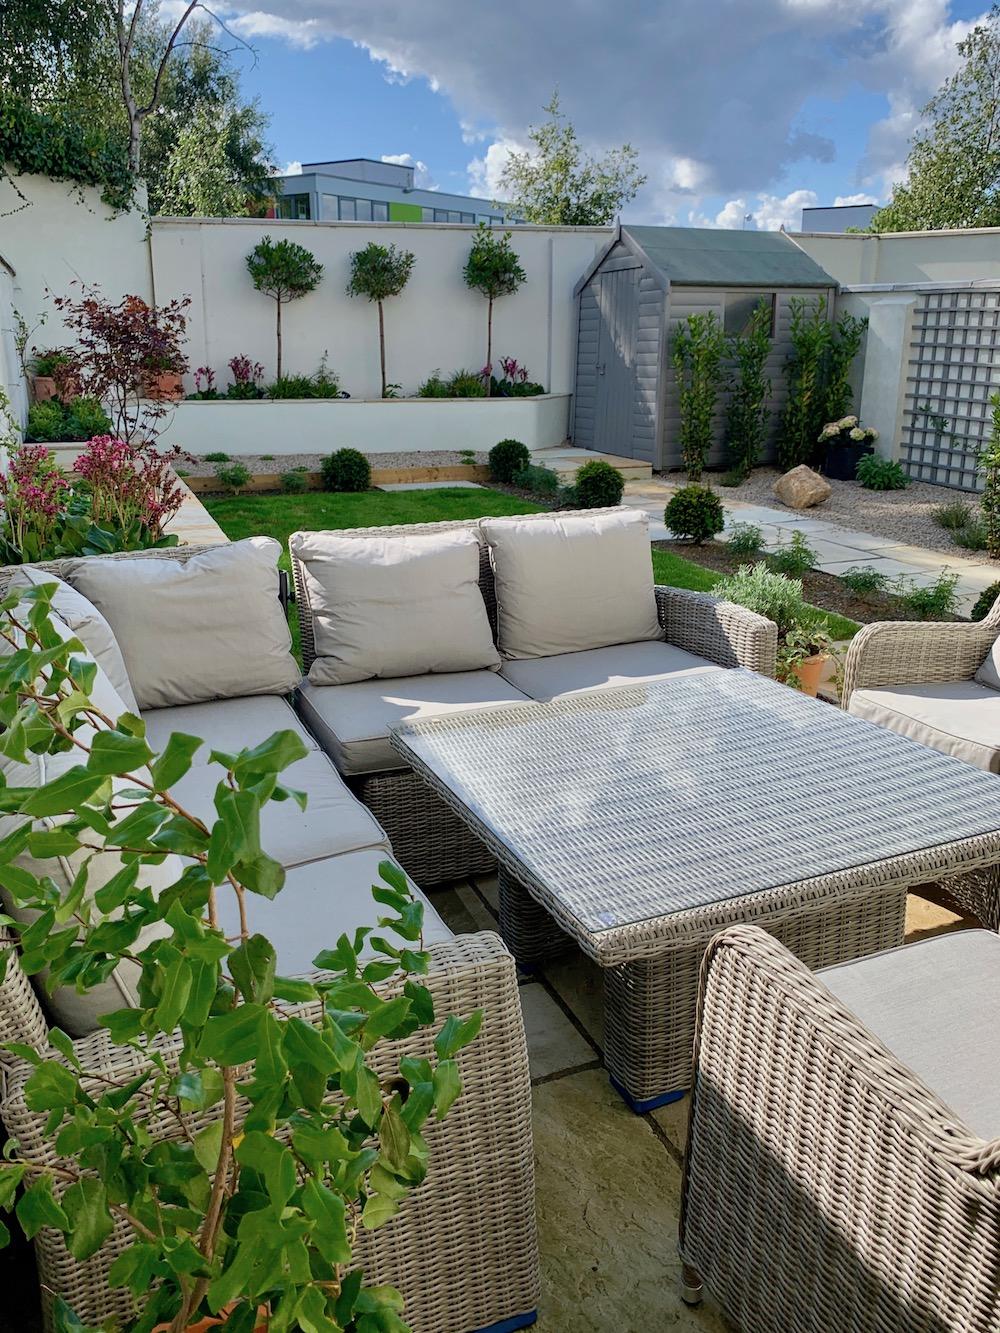 alex-alexandra-hollingsworth-garden-design-london-glenageary2.jpg